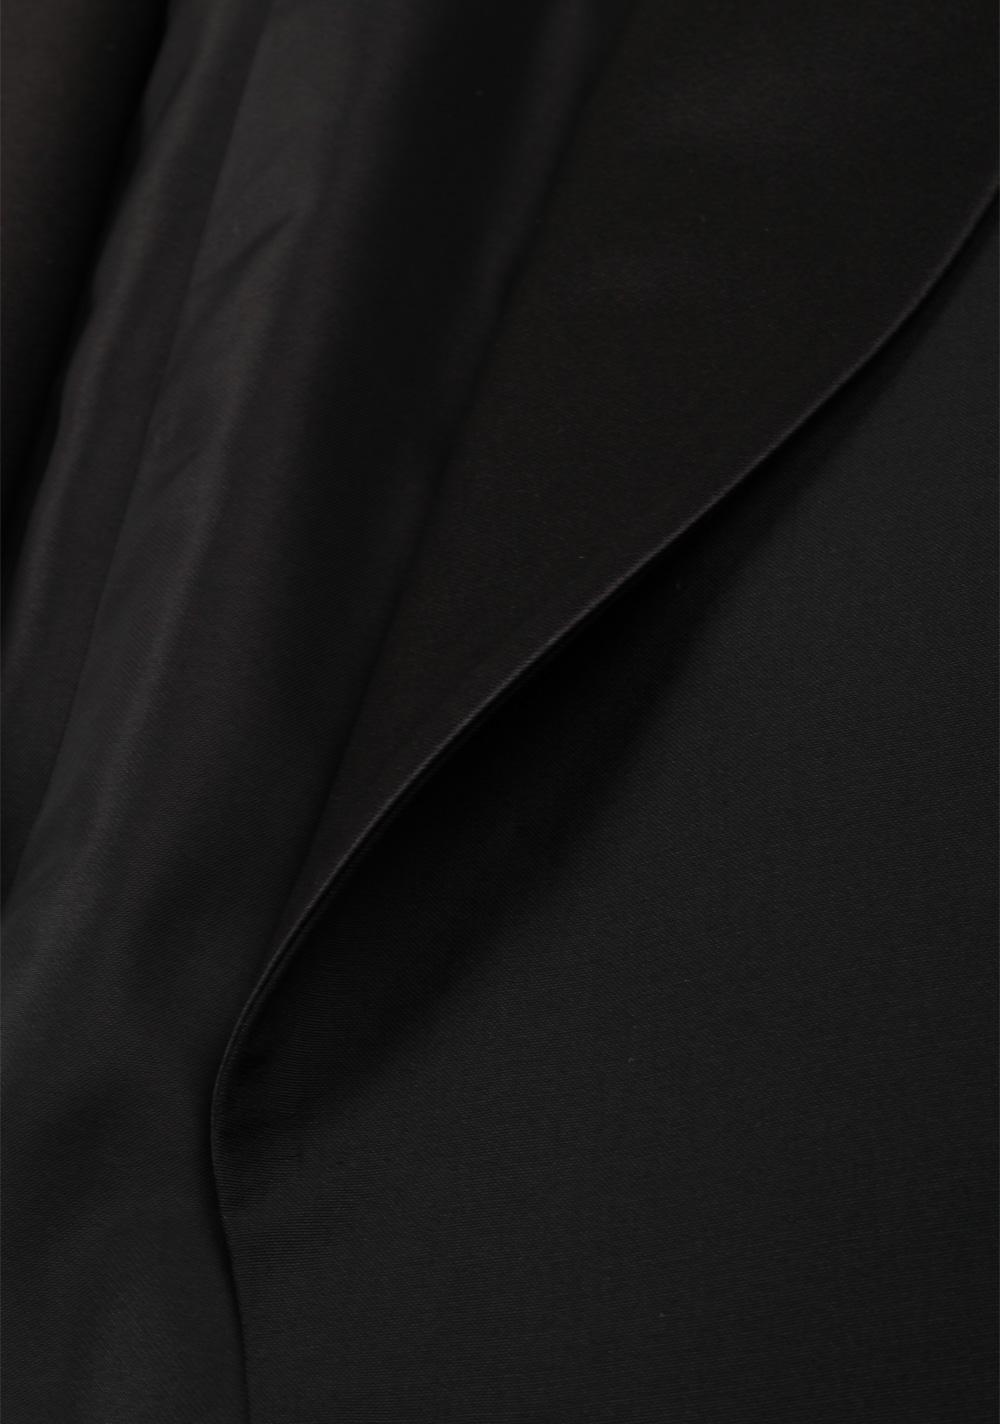 TOM FORD Windsor Black Tuxedo Smoking Suit Size 50 / 40R U.S. Fit A | Costume Limité